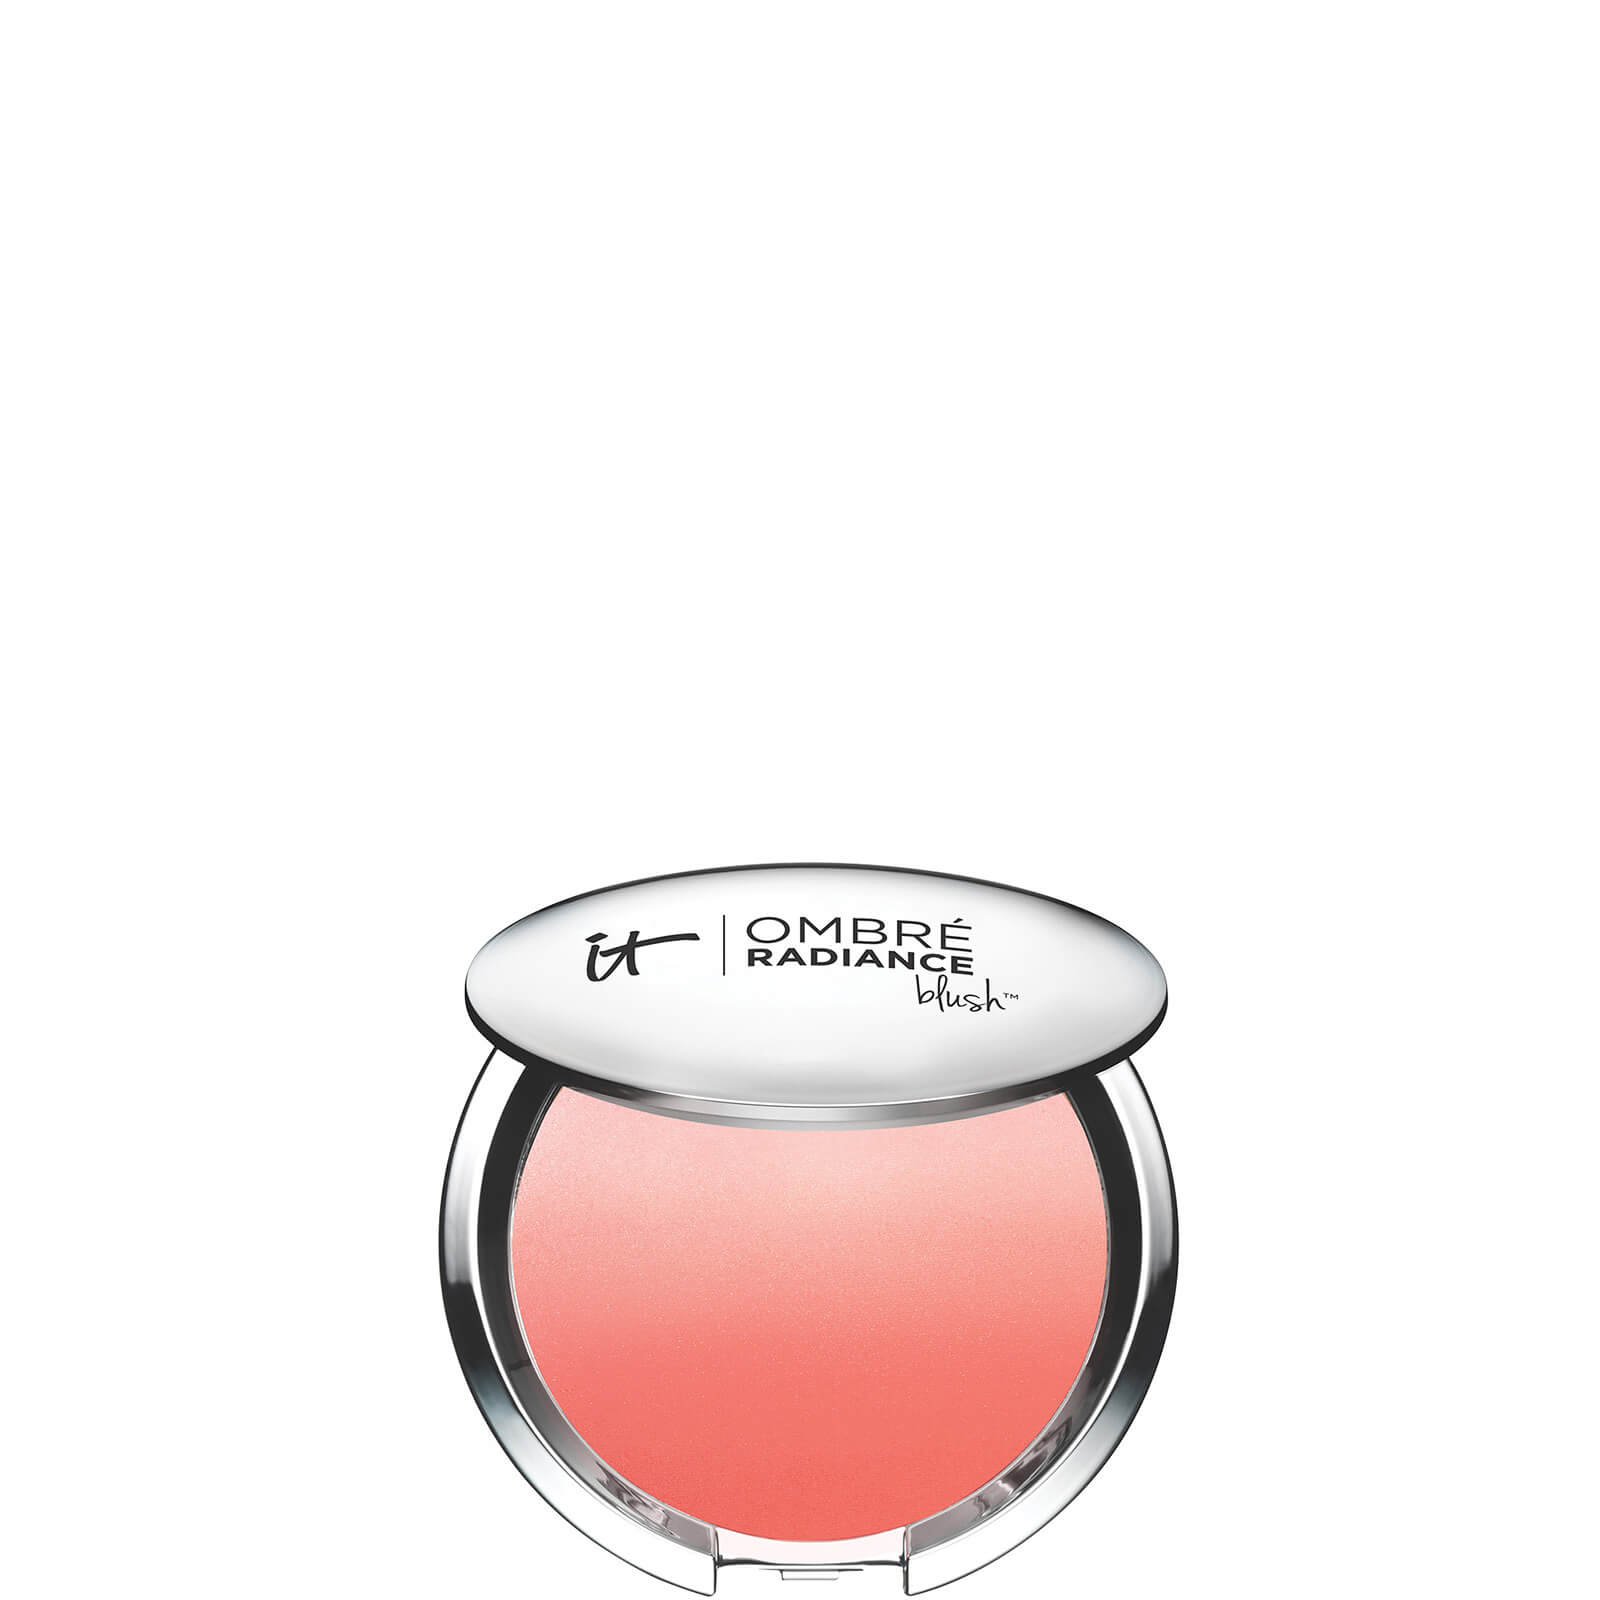 Купить IT Cosmetics Ombré Radiance Blush 10.8g (Various Shades) - Je Ne Sais Quoi